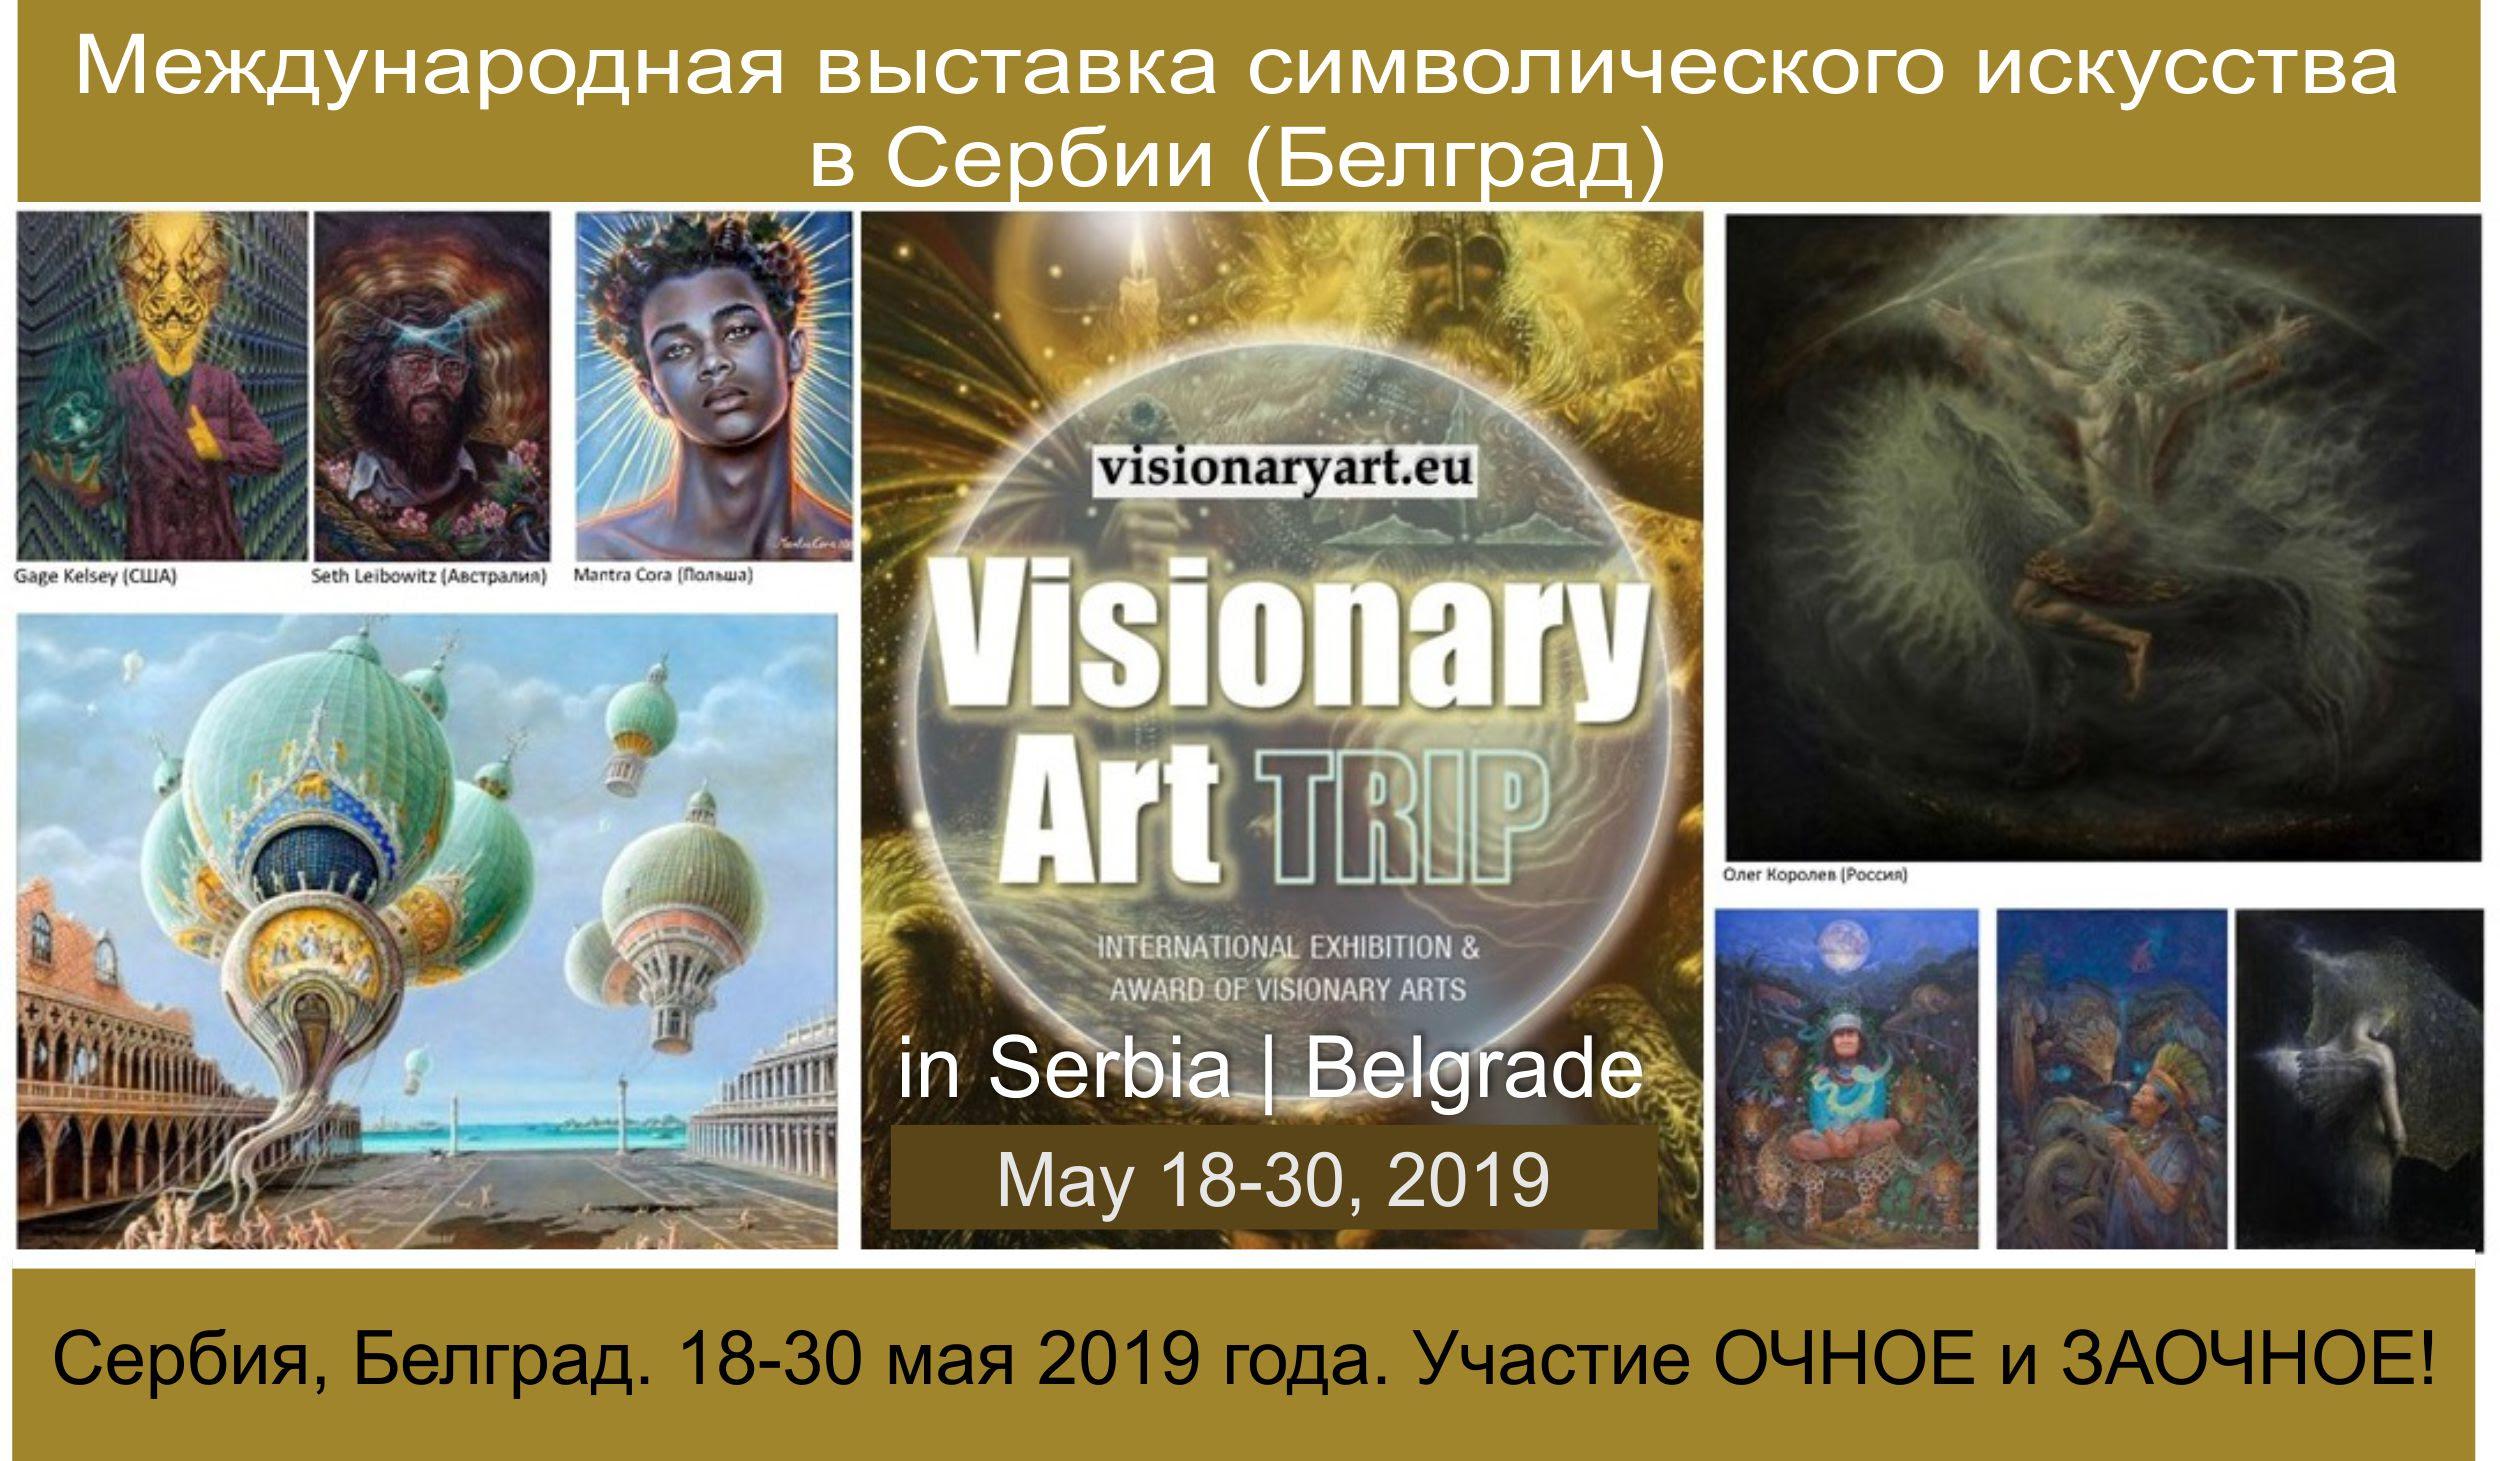 Serbia Exhibit Poster 1 - May 2019.jpg